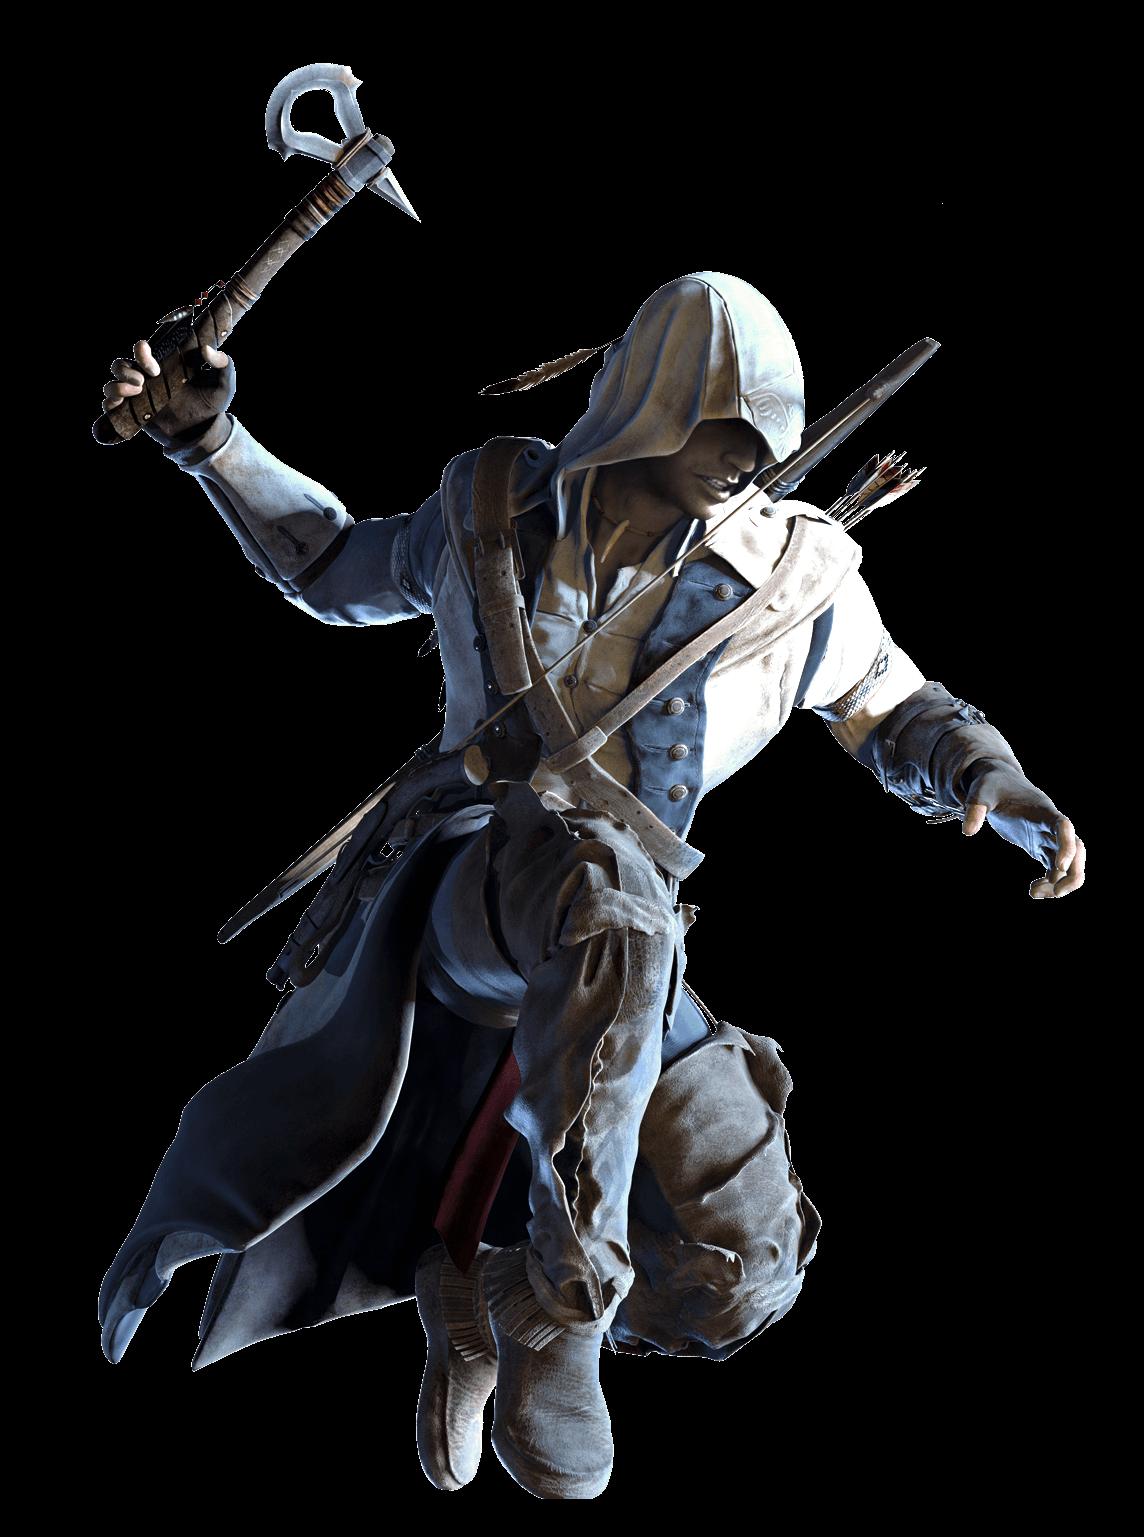 Assassins Creed Jump Transparent Png Stickpng